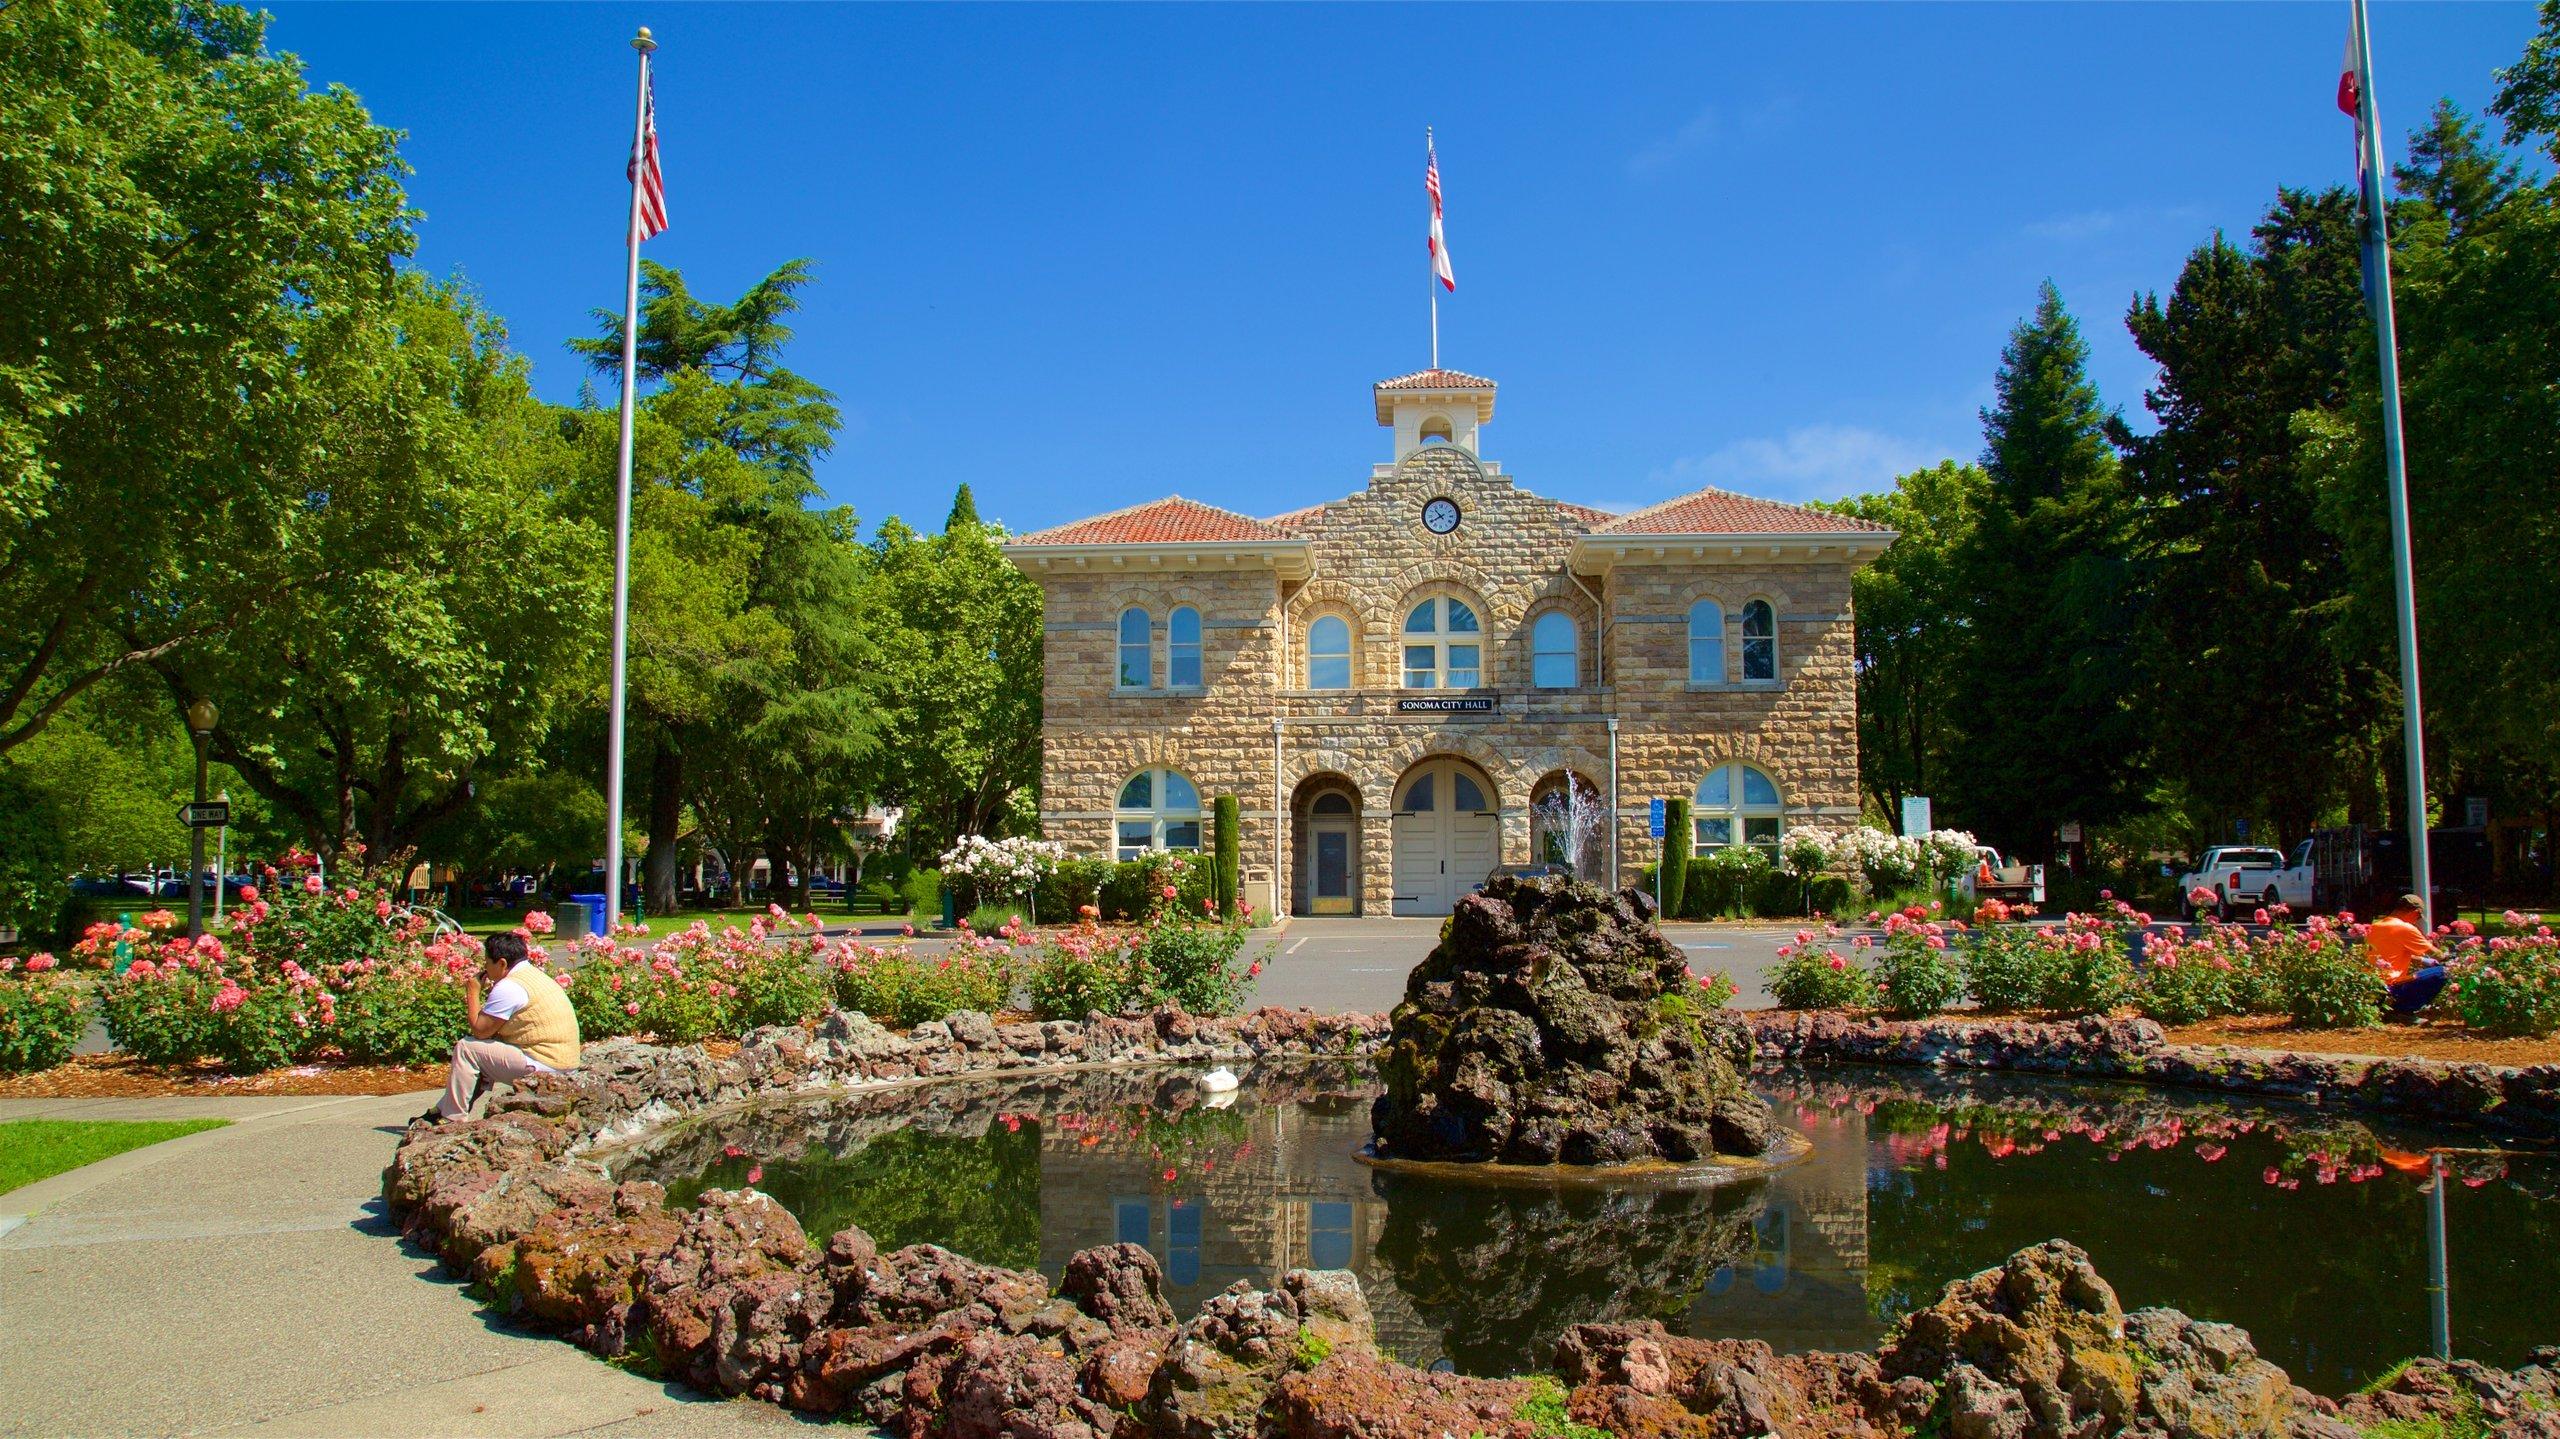 Sonoma, California, United States of America